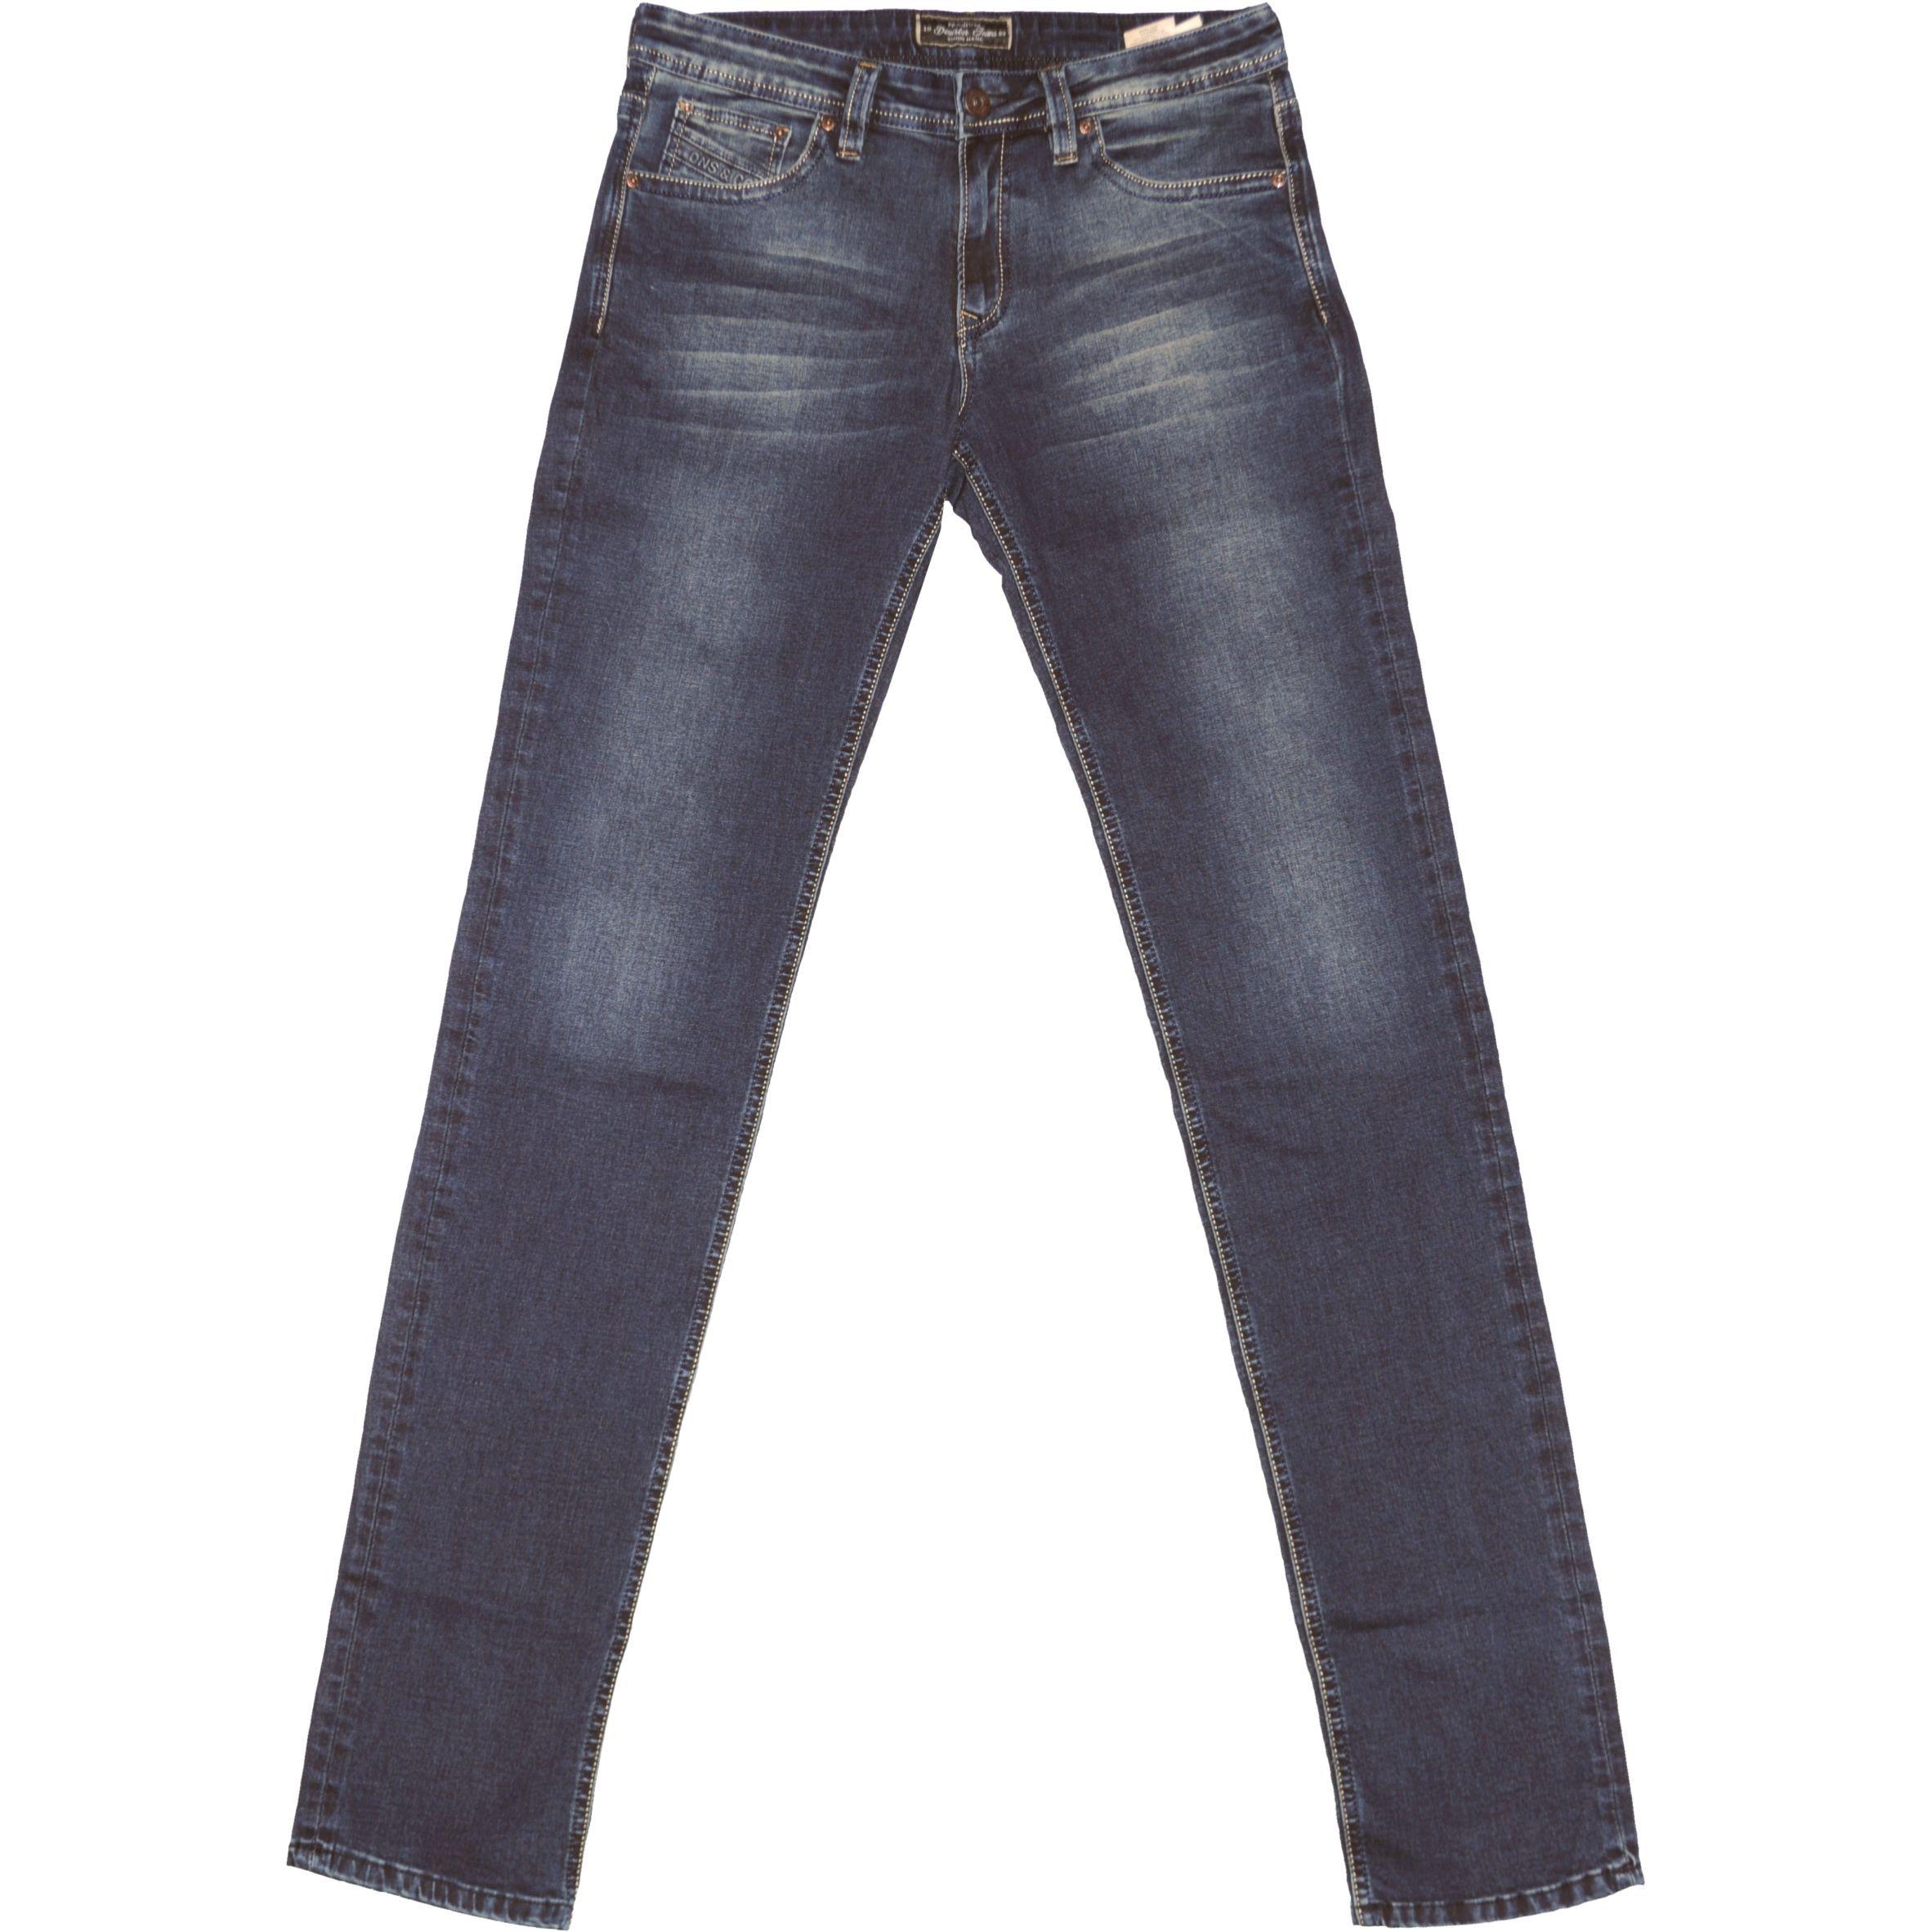 b52edc81b1 Denistar Jeans 867 Wyoming Extra Hosszú | FarmerParadicsom Webáruház